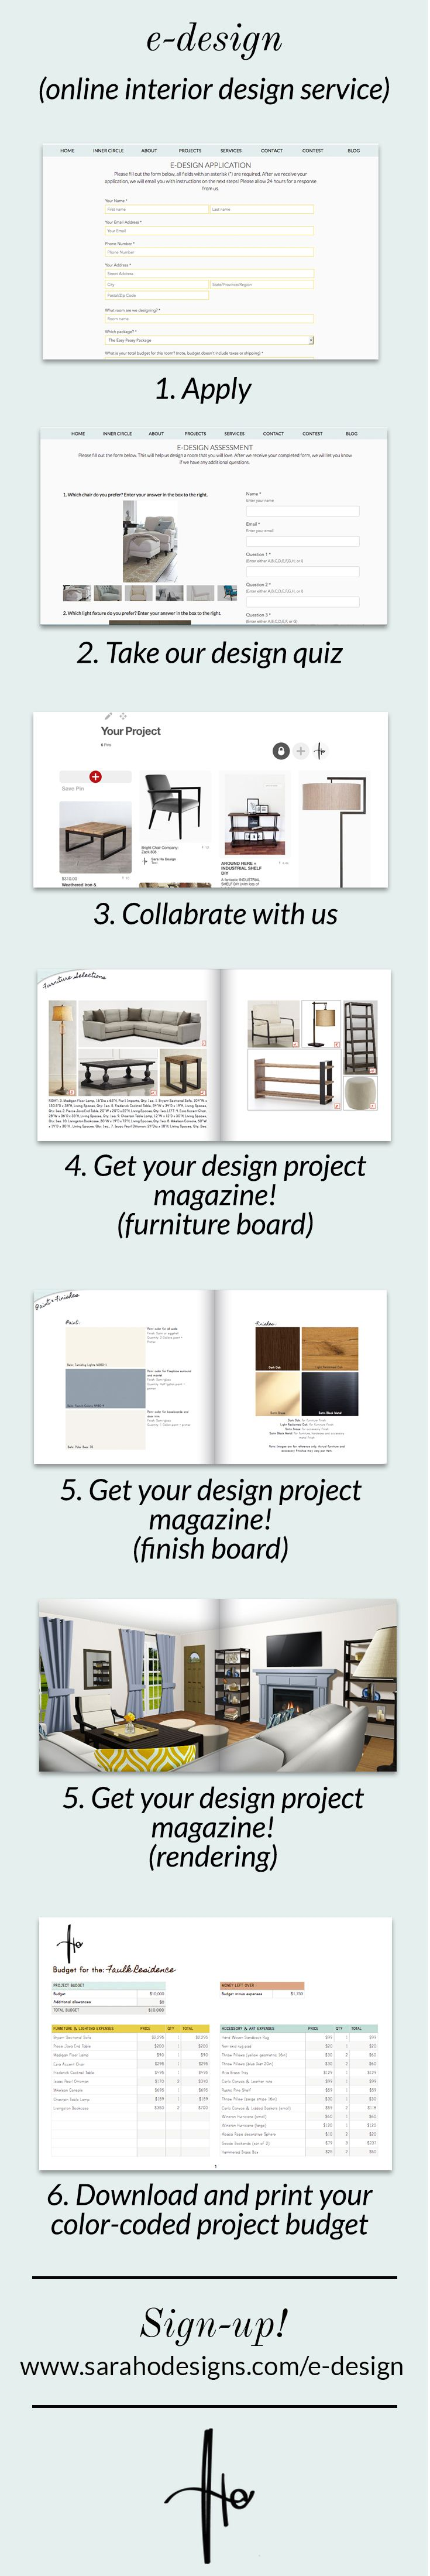 edesign   online interior design   virtual interior design   interior design services   edesign services   edesign process   shd edesign